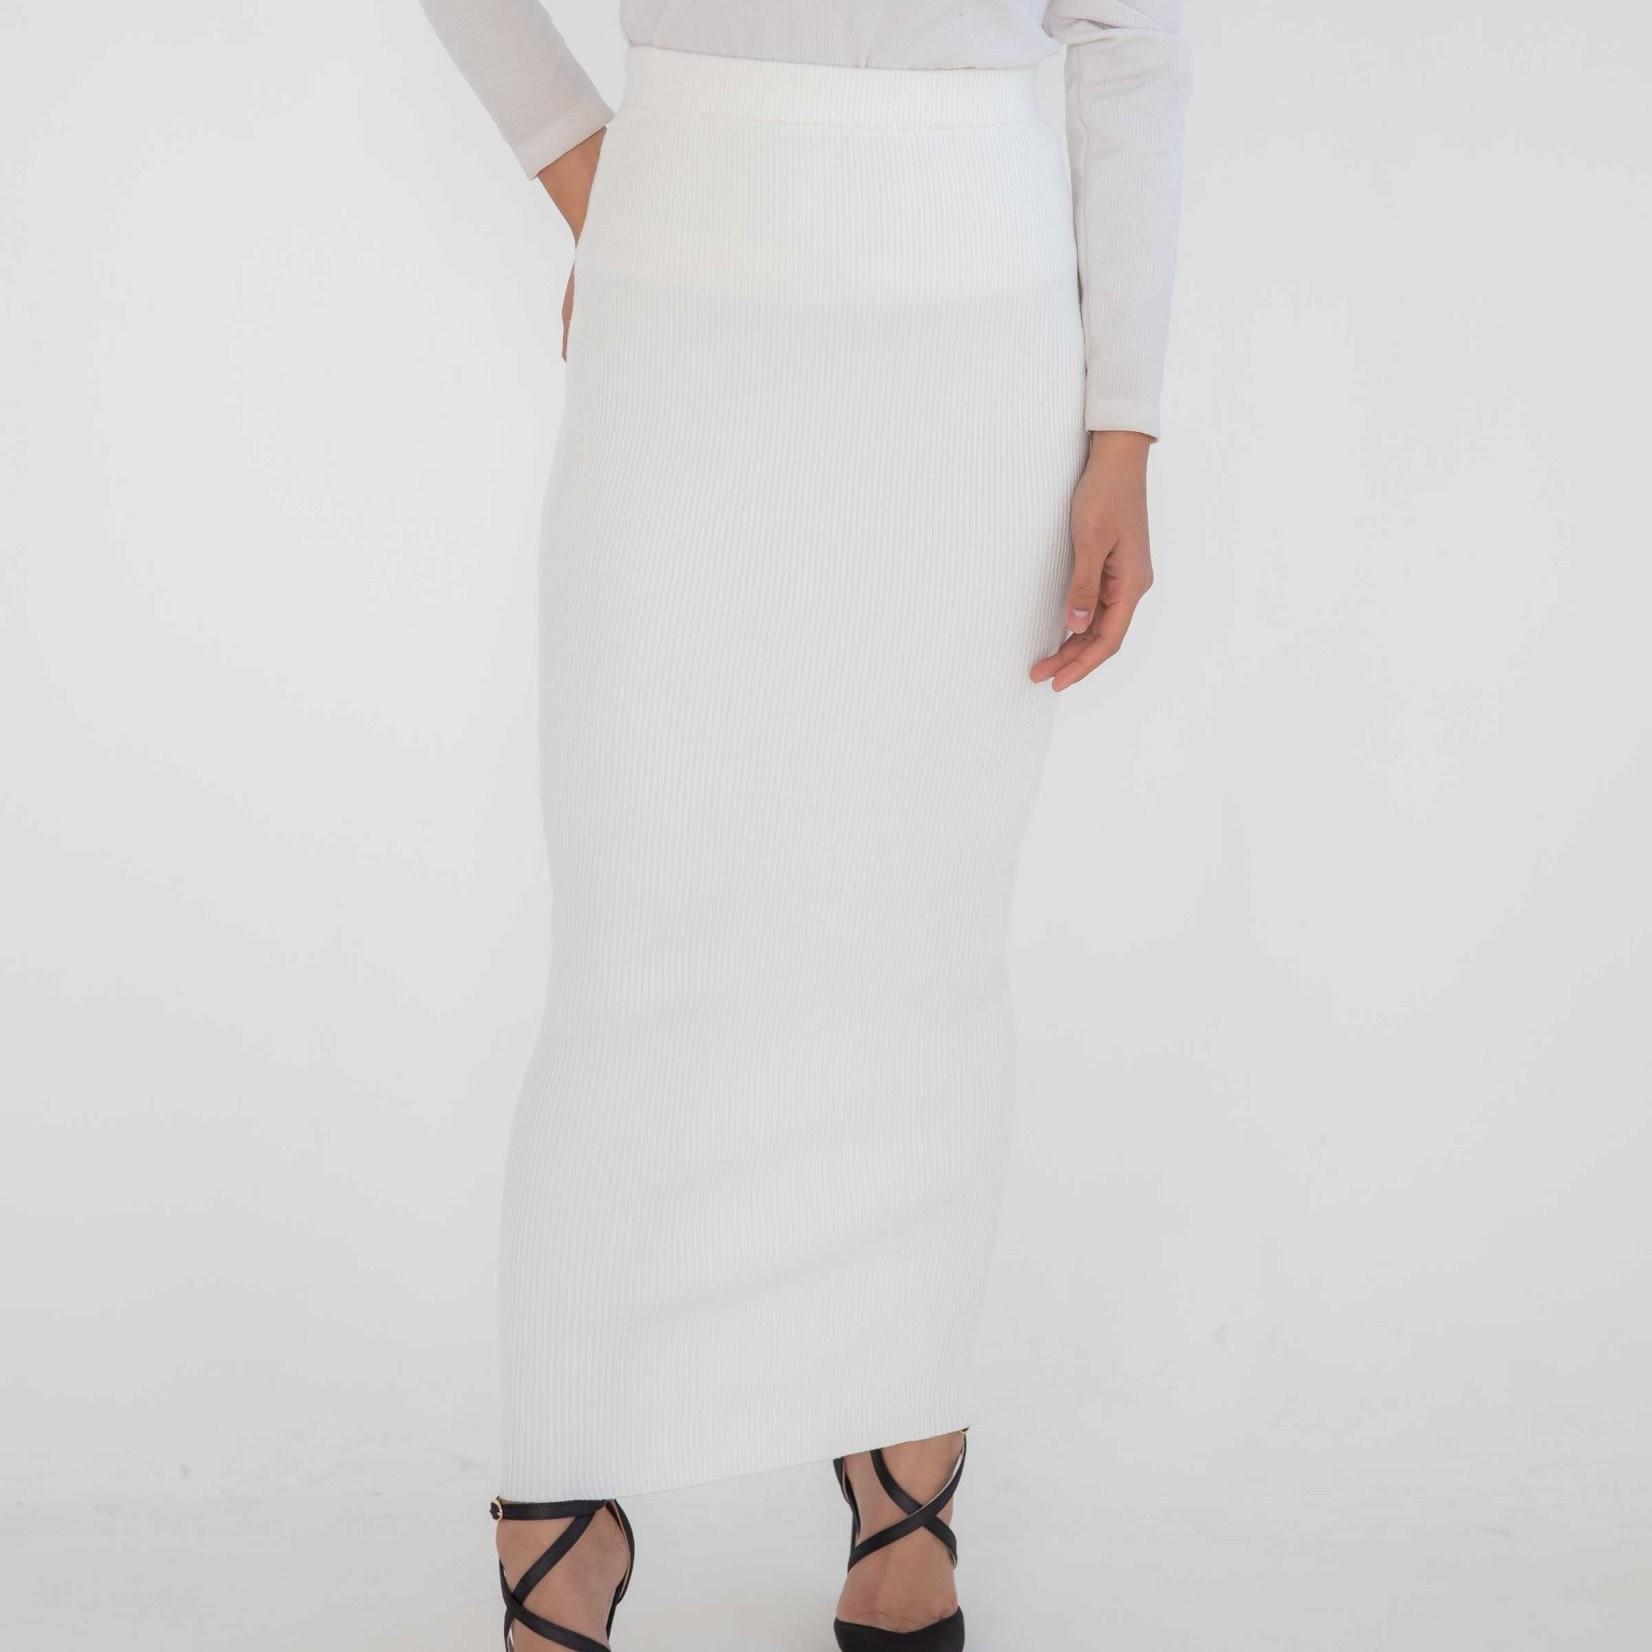 Nasiba Fashion Ivory Ribbed Skirt